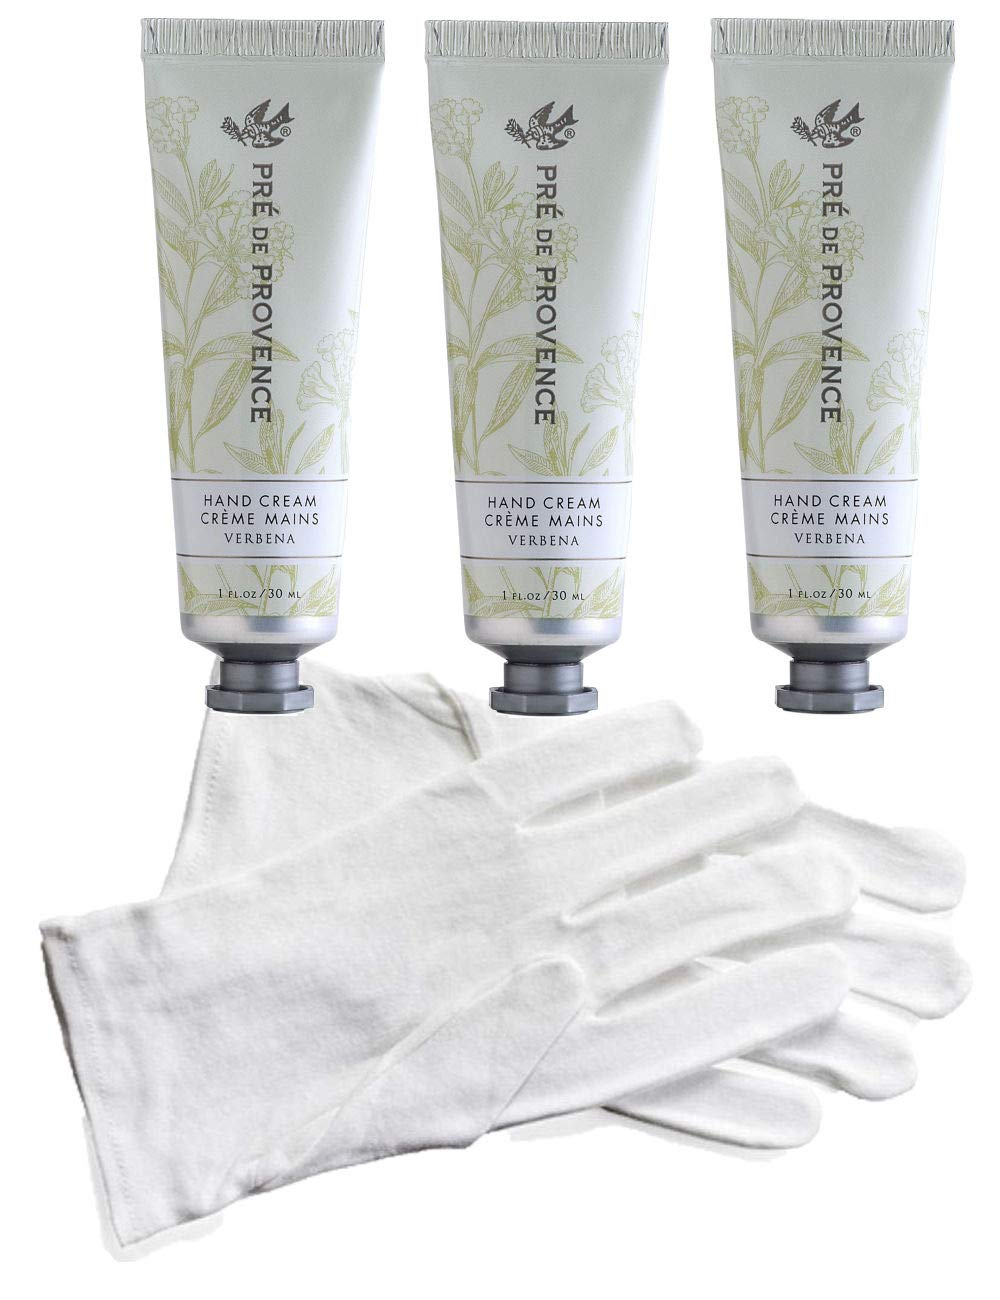 Three (3) Tubes Pre de Provence 1 Ounce Shea Butter Hand Creams - Verbena PLUS 1 Pair White Cotton Gloves for Overnight Moisturization